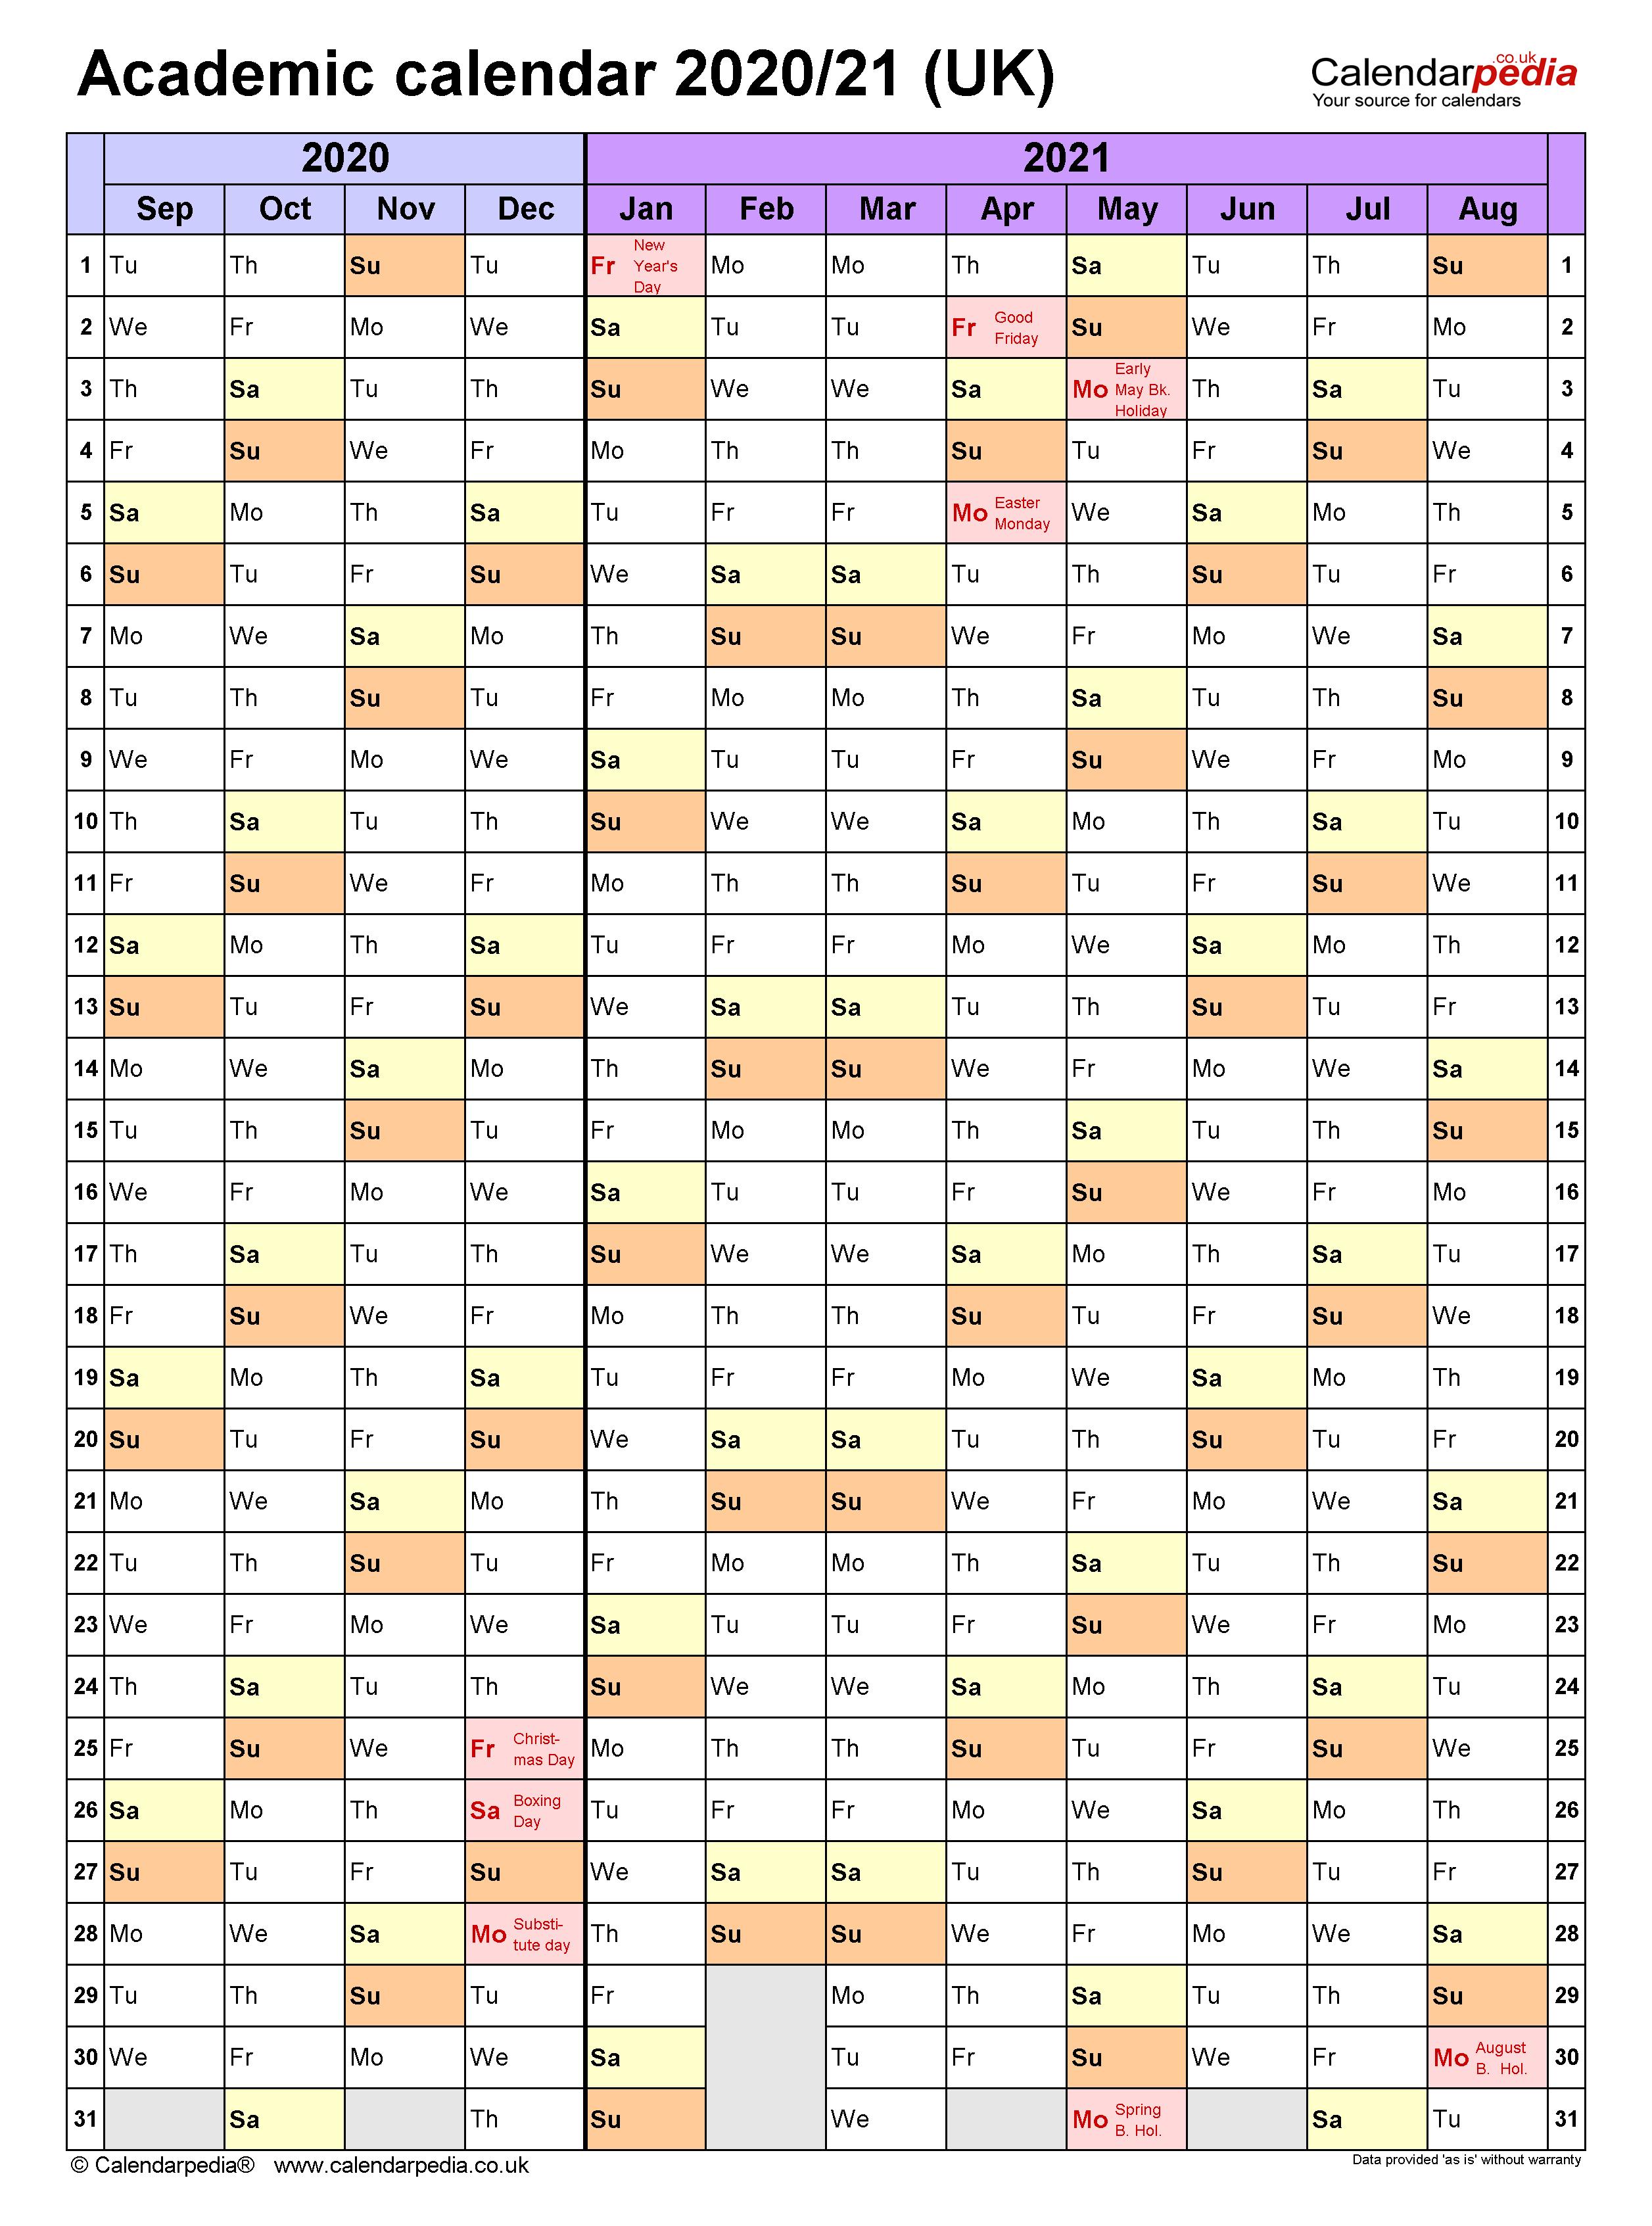 Academic calendars 2020/21 UK - free printable Word templates